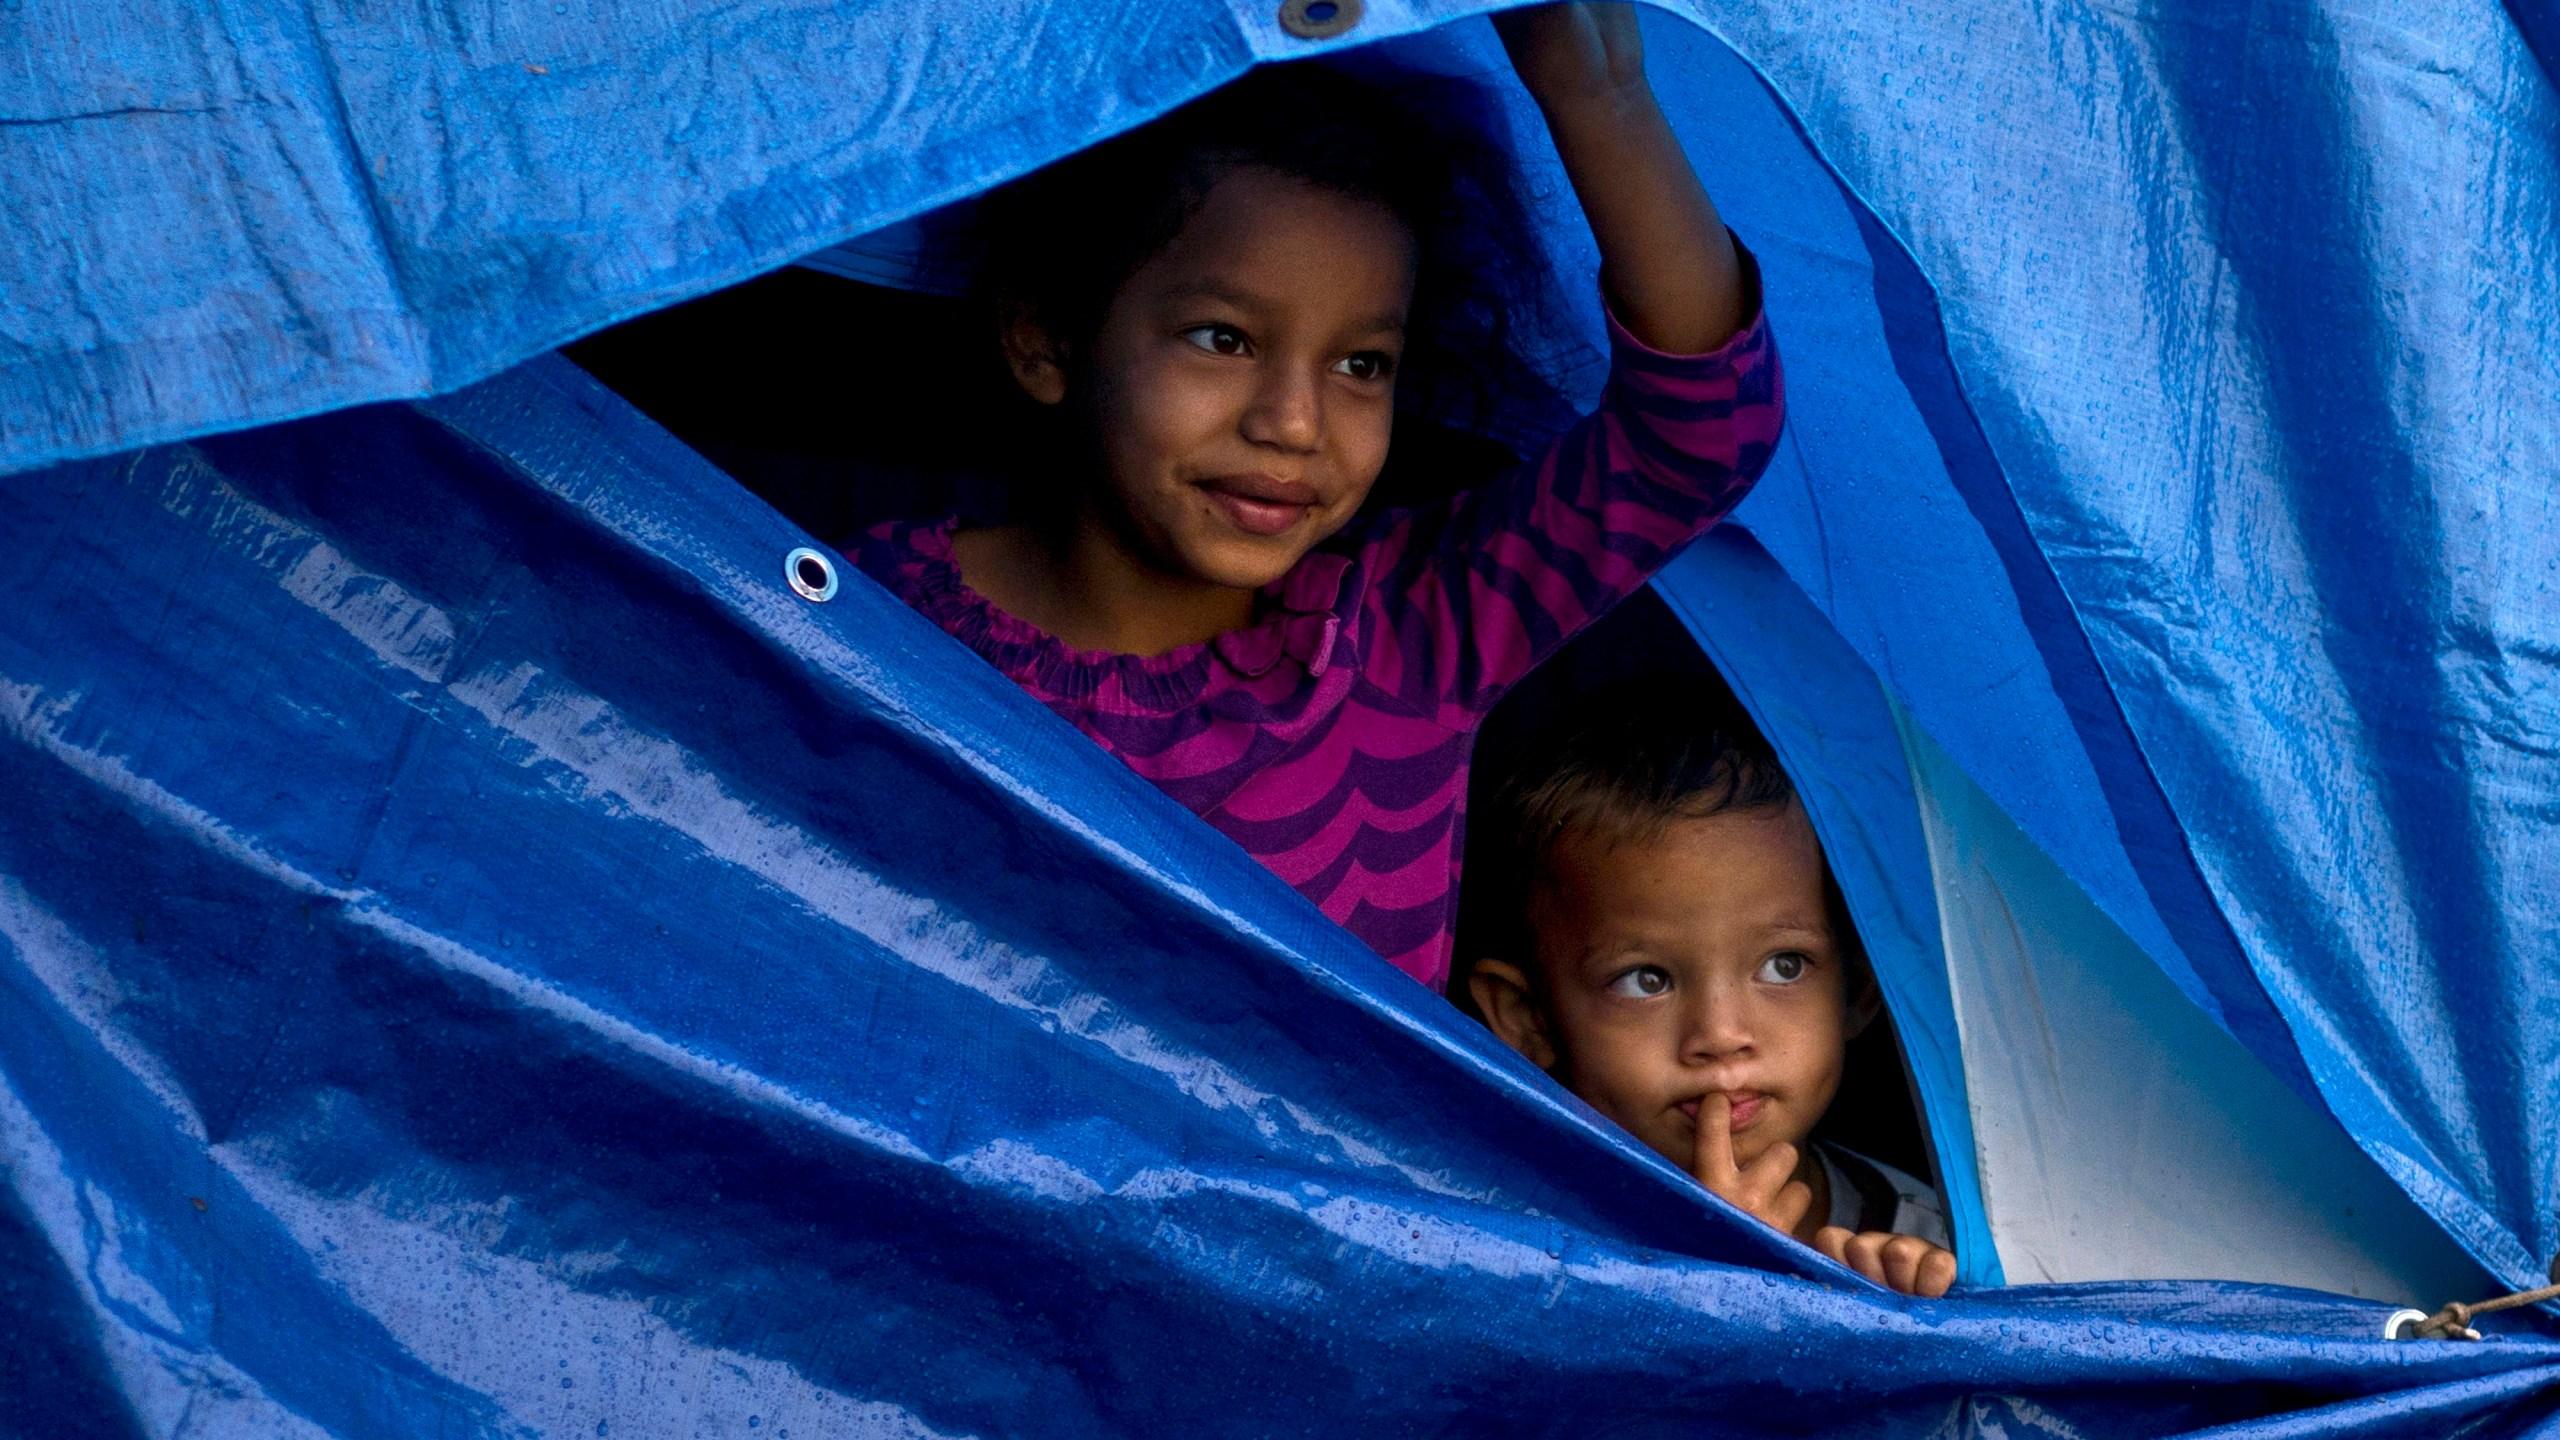 Central_America_Migrant_Caravan_29360-159532.jpg96741456